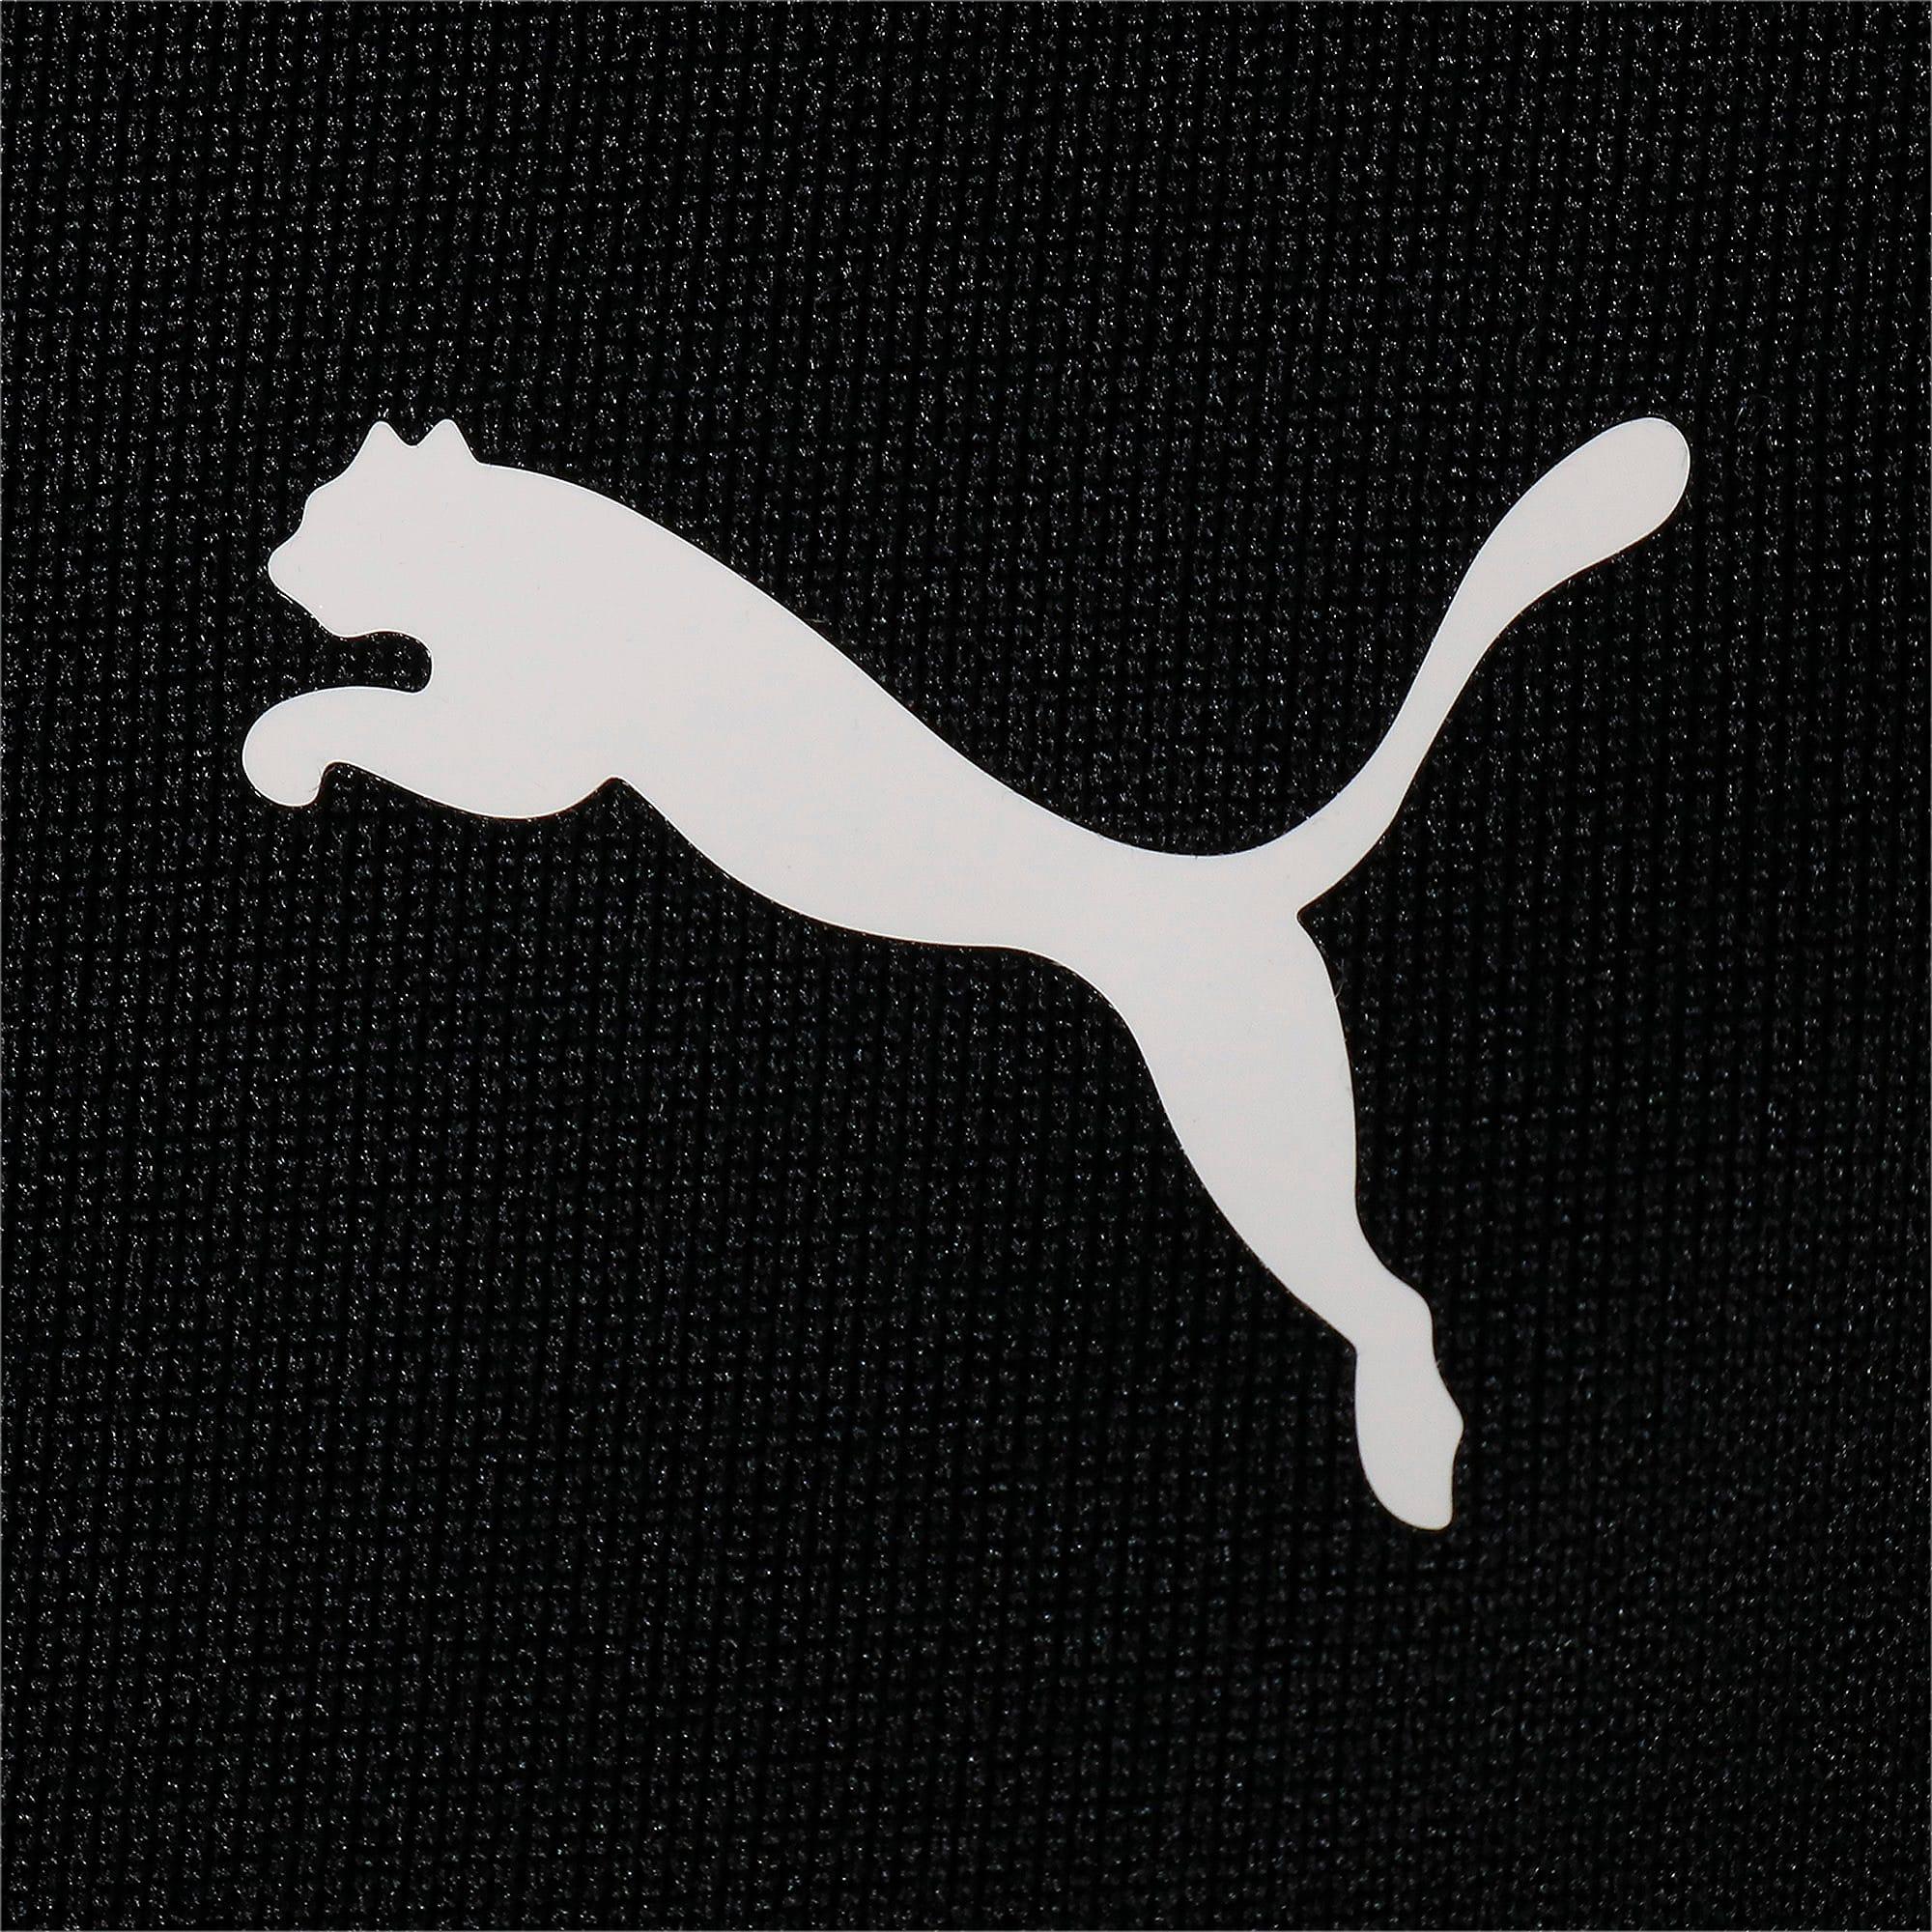 Thumbnail 4 of フィール イット ウィメンズ トレーニング ジャケット, Puma Black, medium-JPN